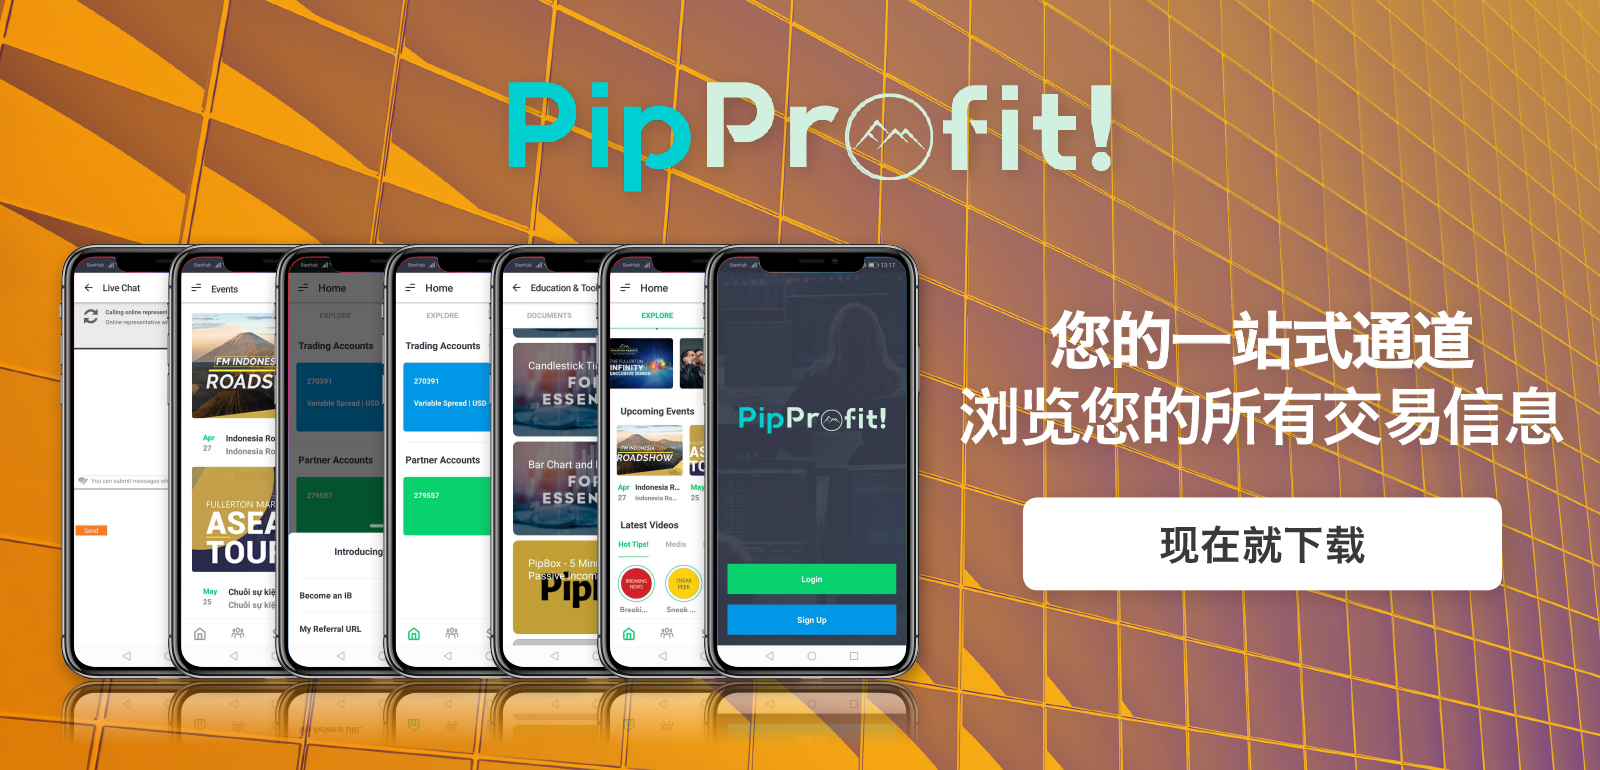 CN_PipProfit-Web-Sliders_1600x770px.jpg